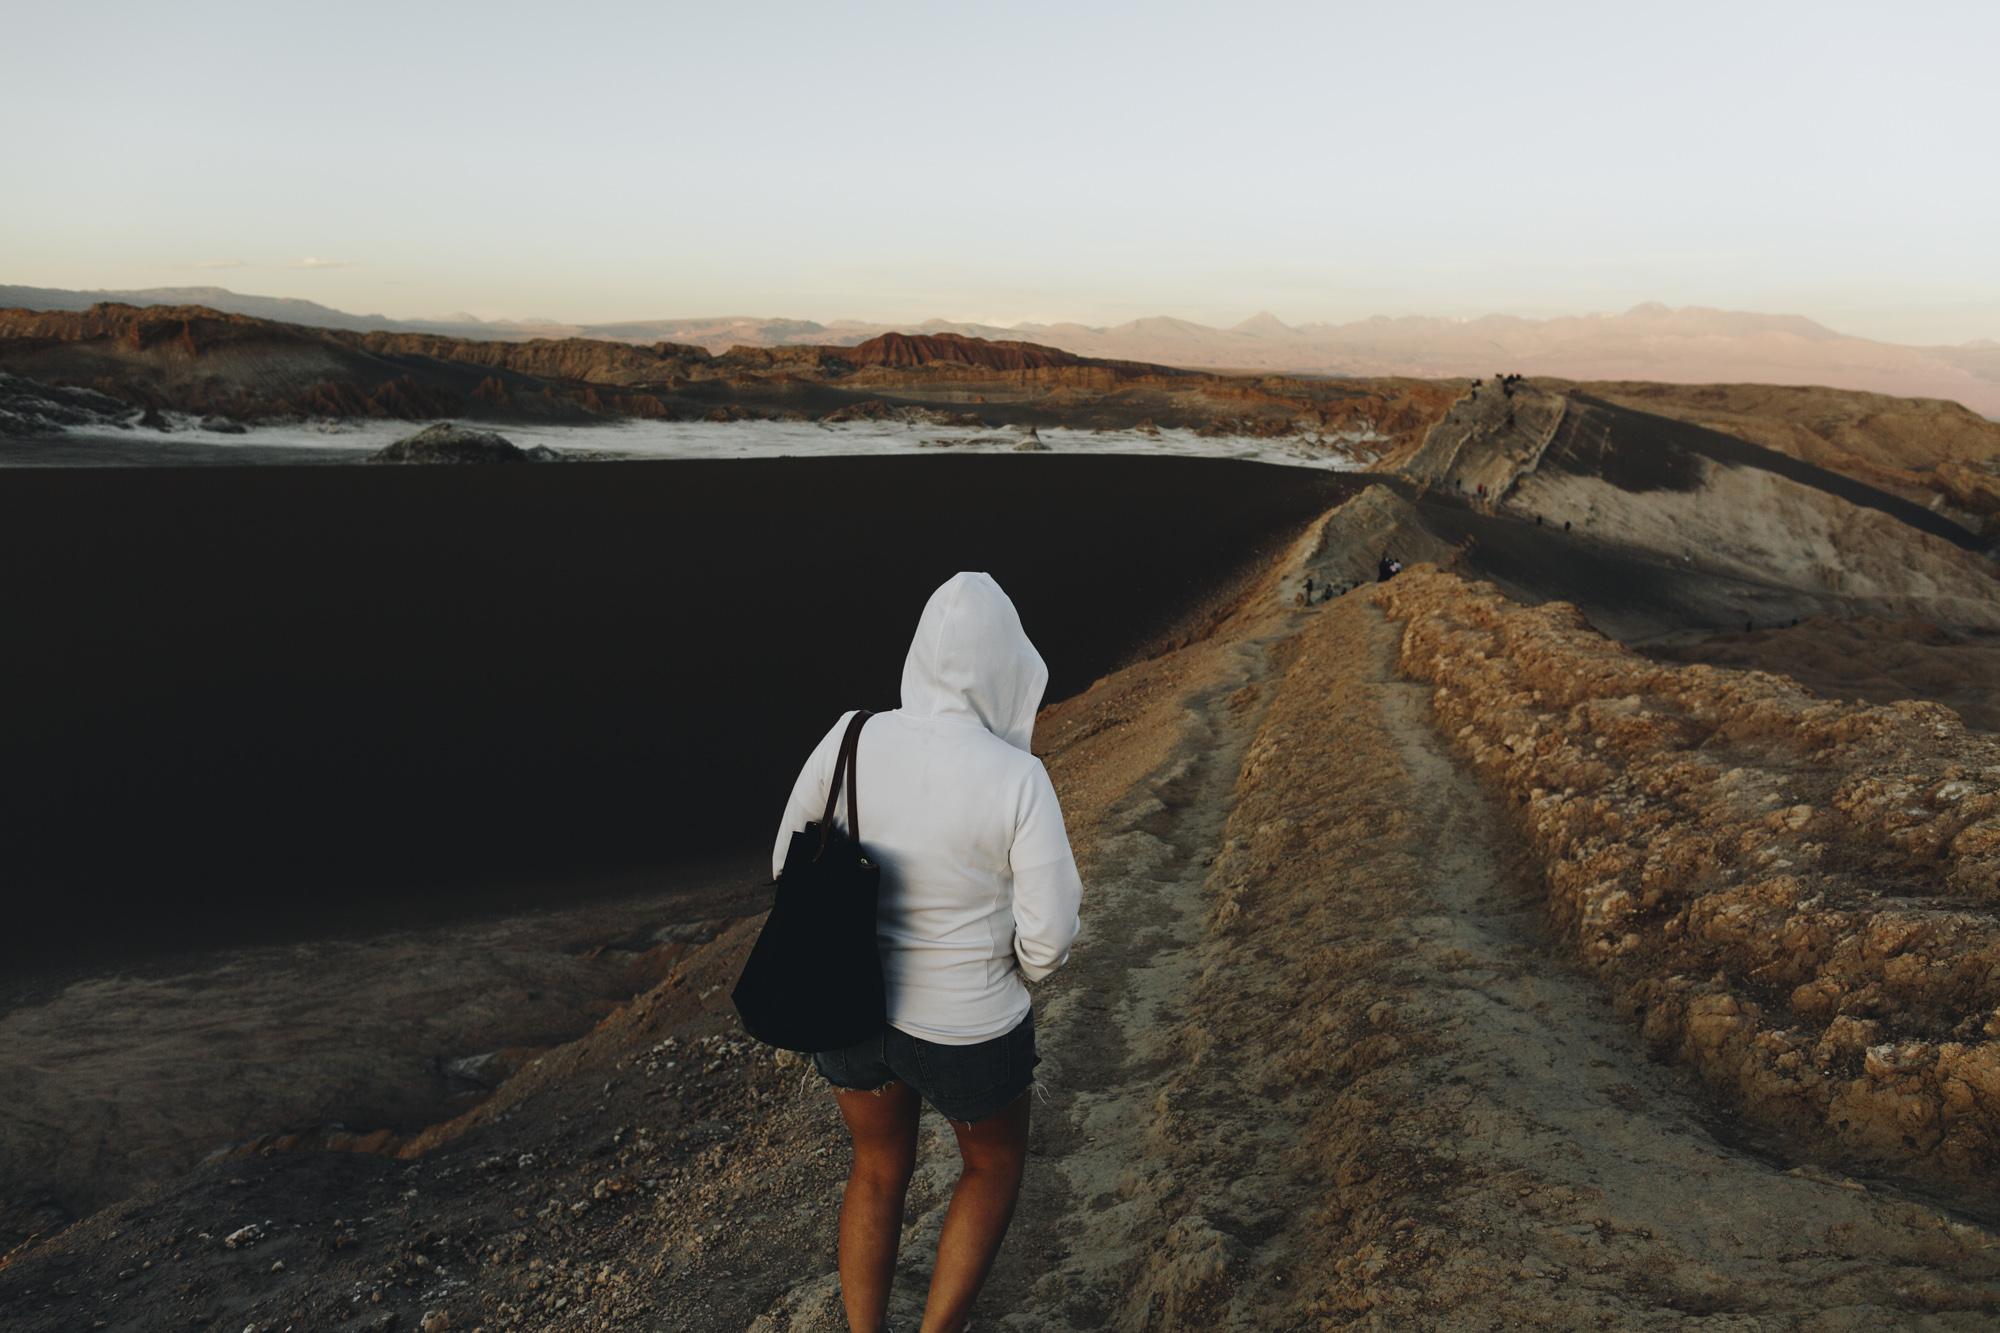 Mael Lambla photographer Chile San pedro atacama desert-197.jpg